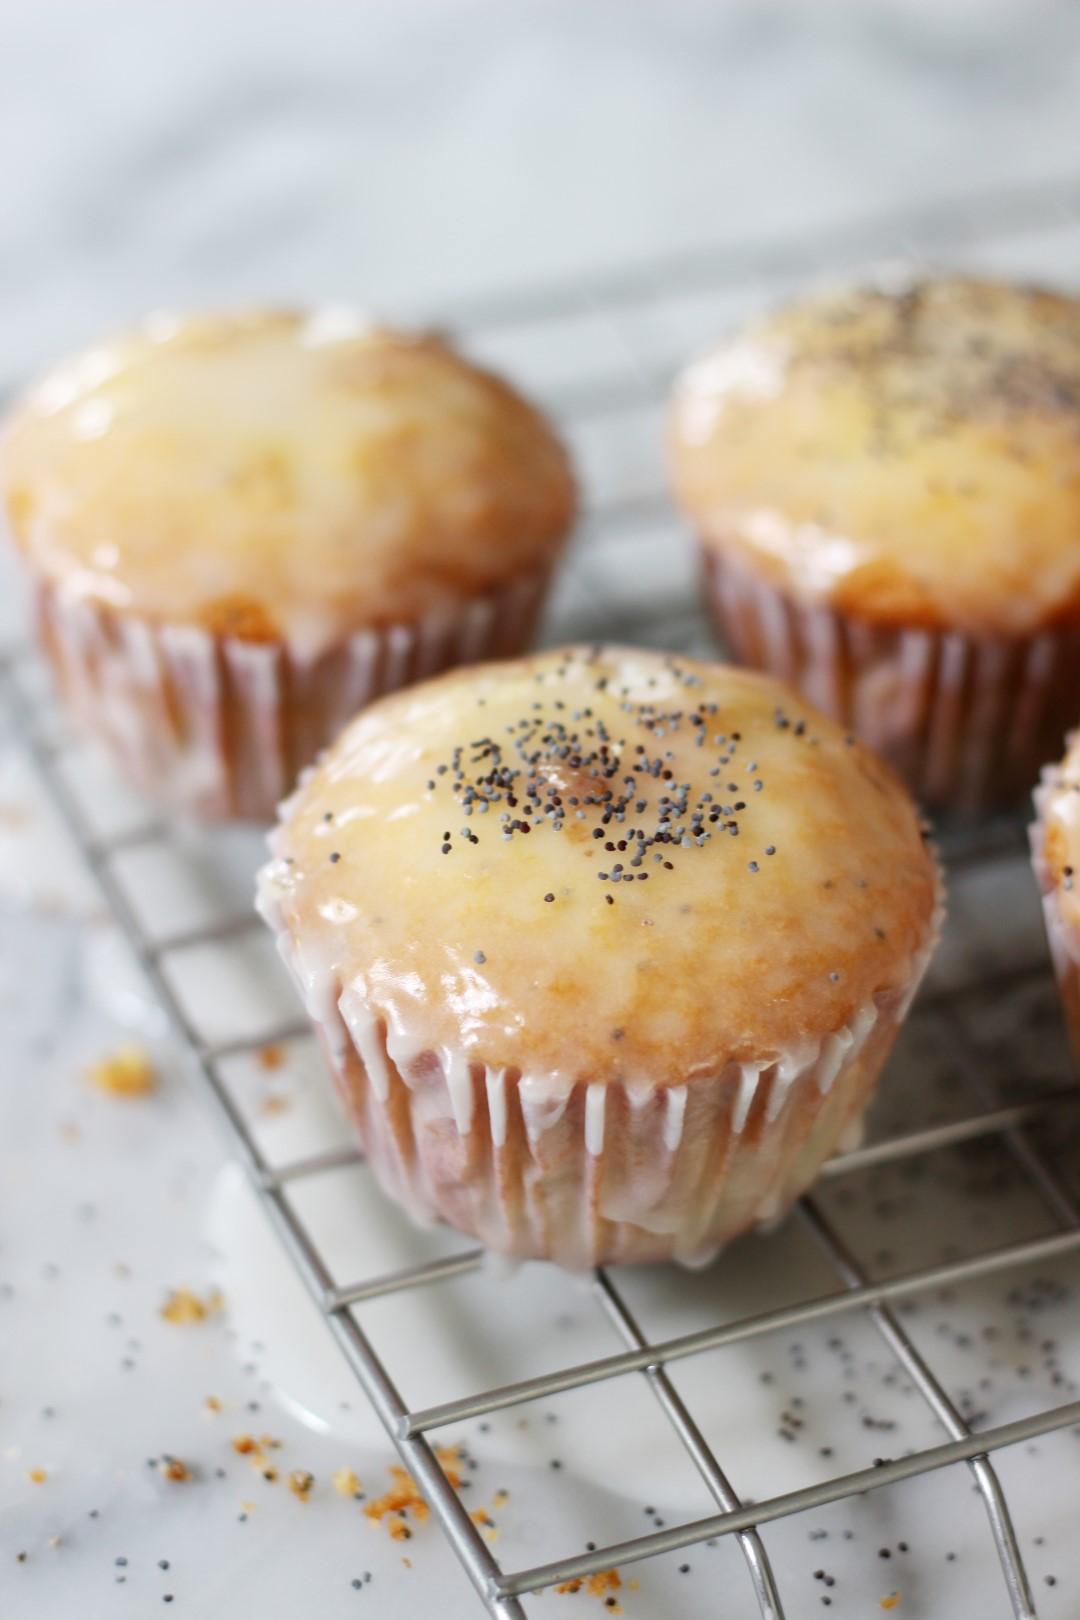 muffins de limón sin gluten, recetas aptas para celíacos, recetas sin tacc, sin trigo, gluten free.